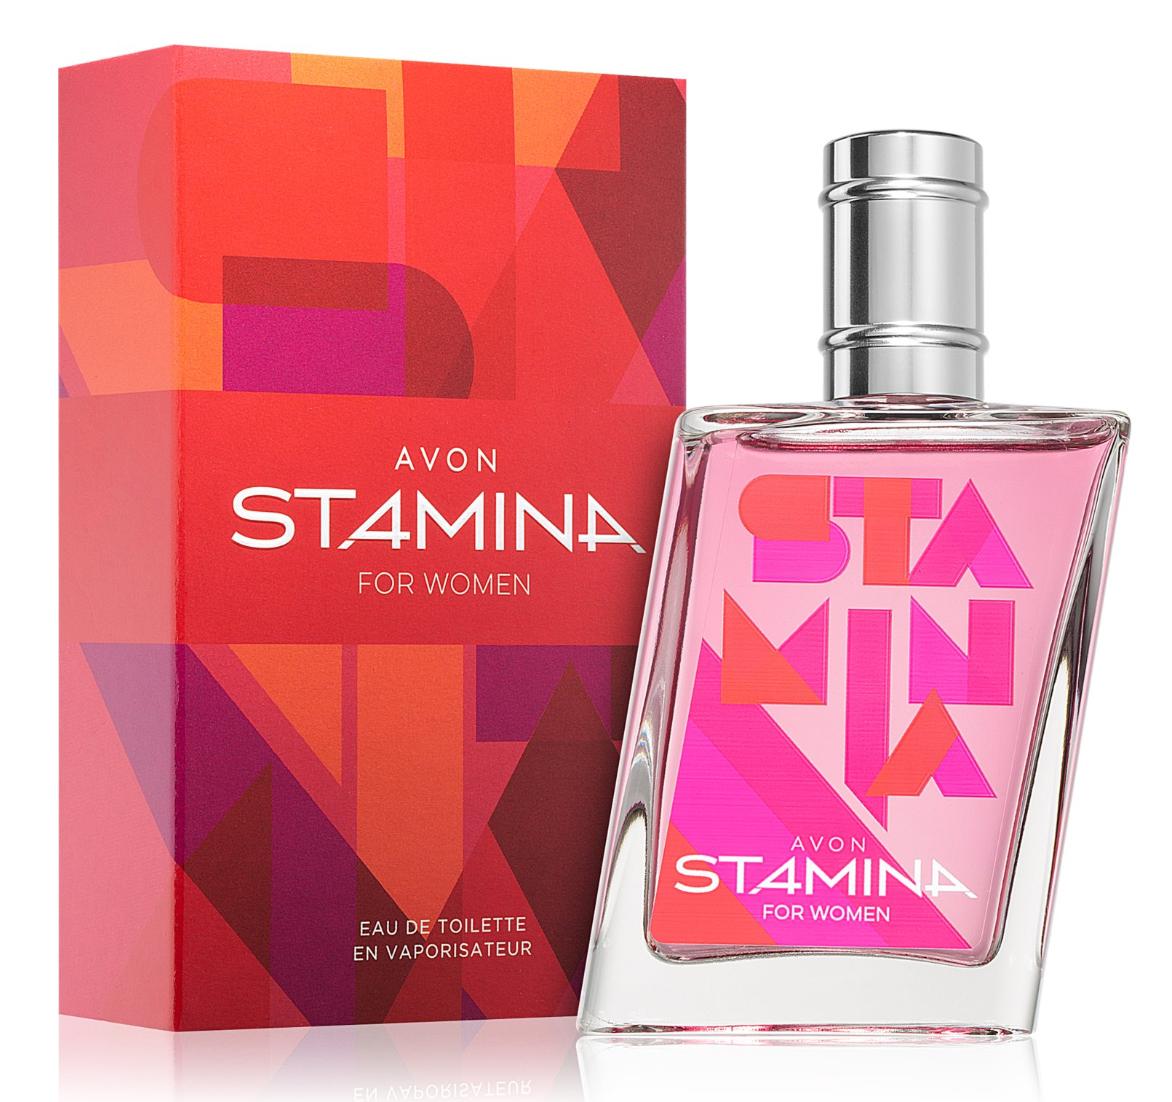 Avon stamina хочу быть представителем avon